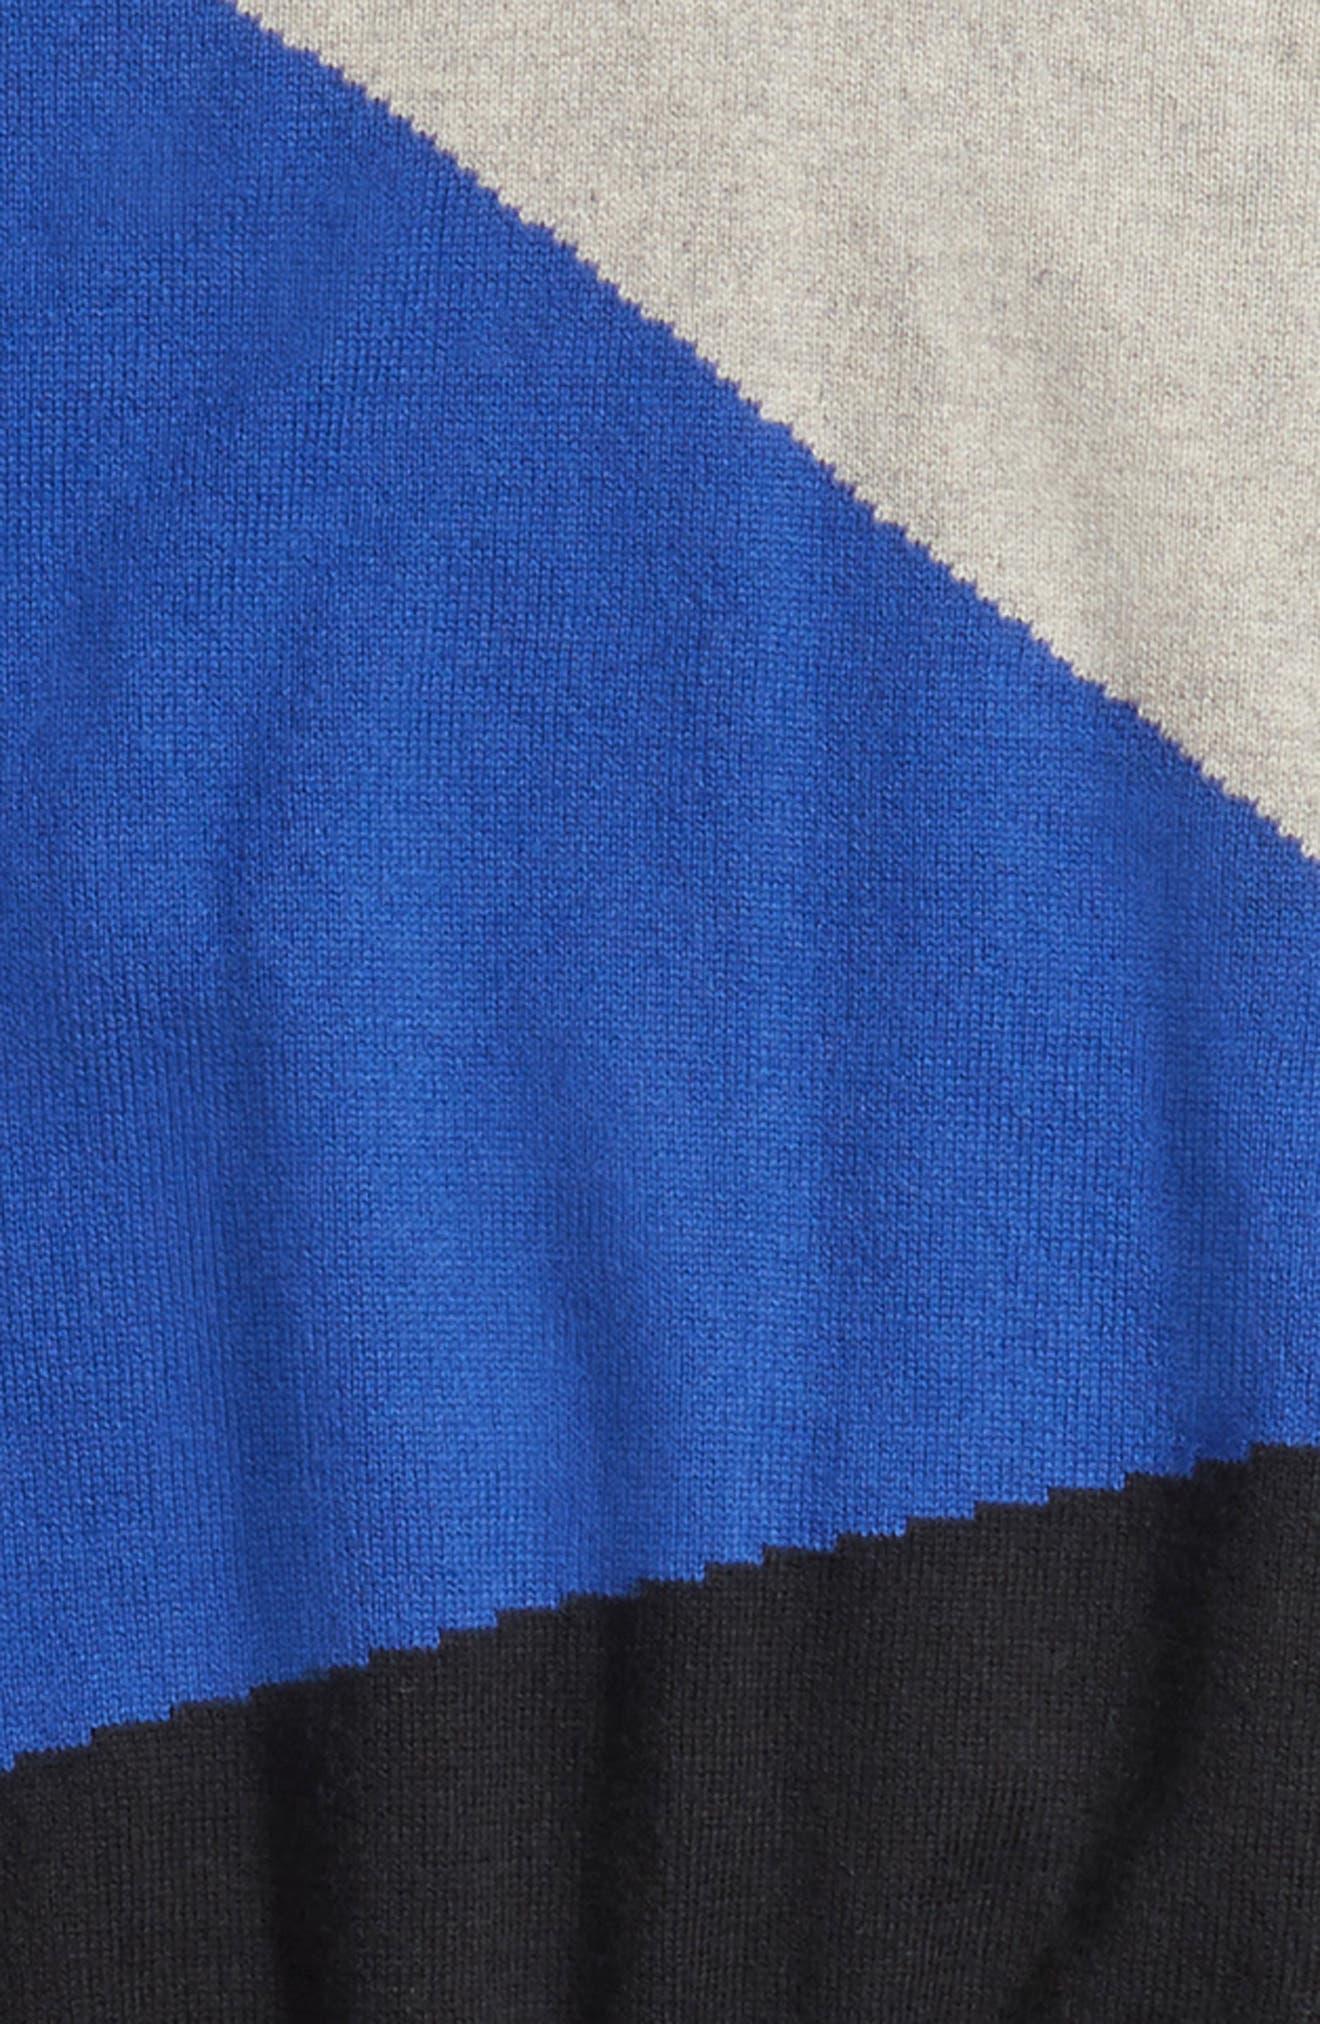 Colorblock Sweater,                             Alternate thumbnail 2, color,                             482